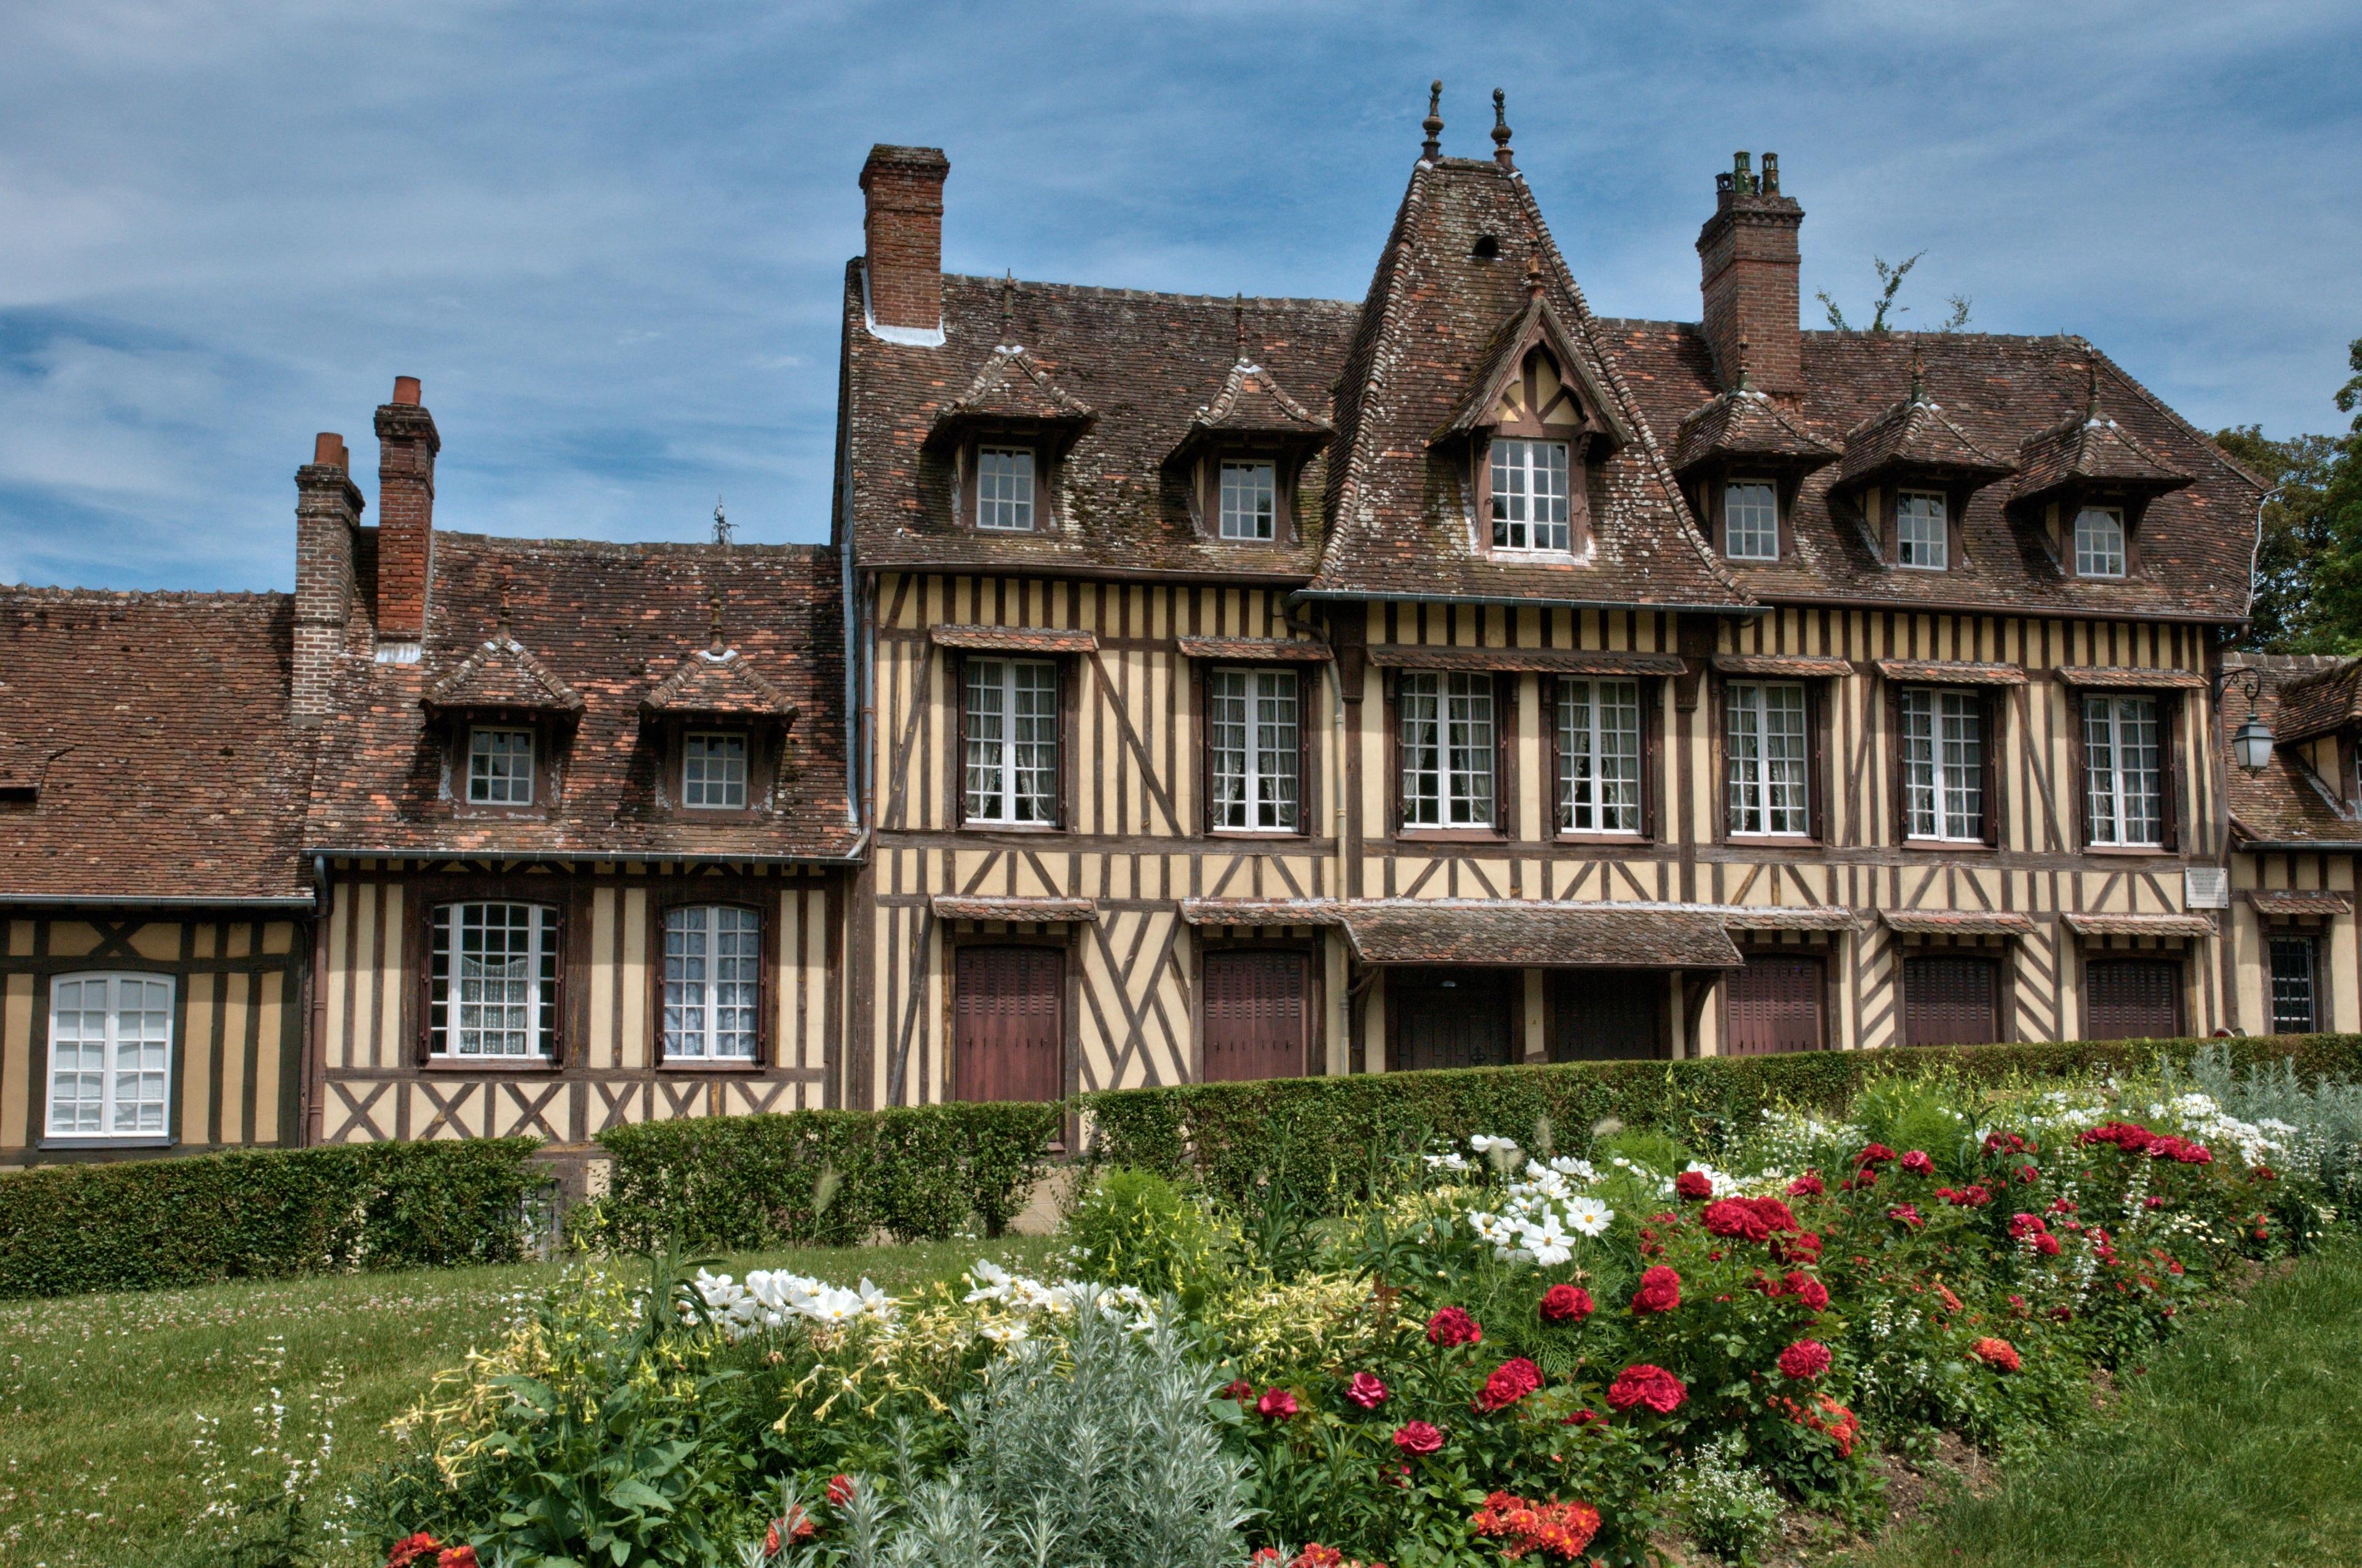 Lyons-la-Foret, Eure, France